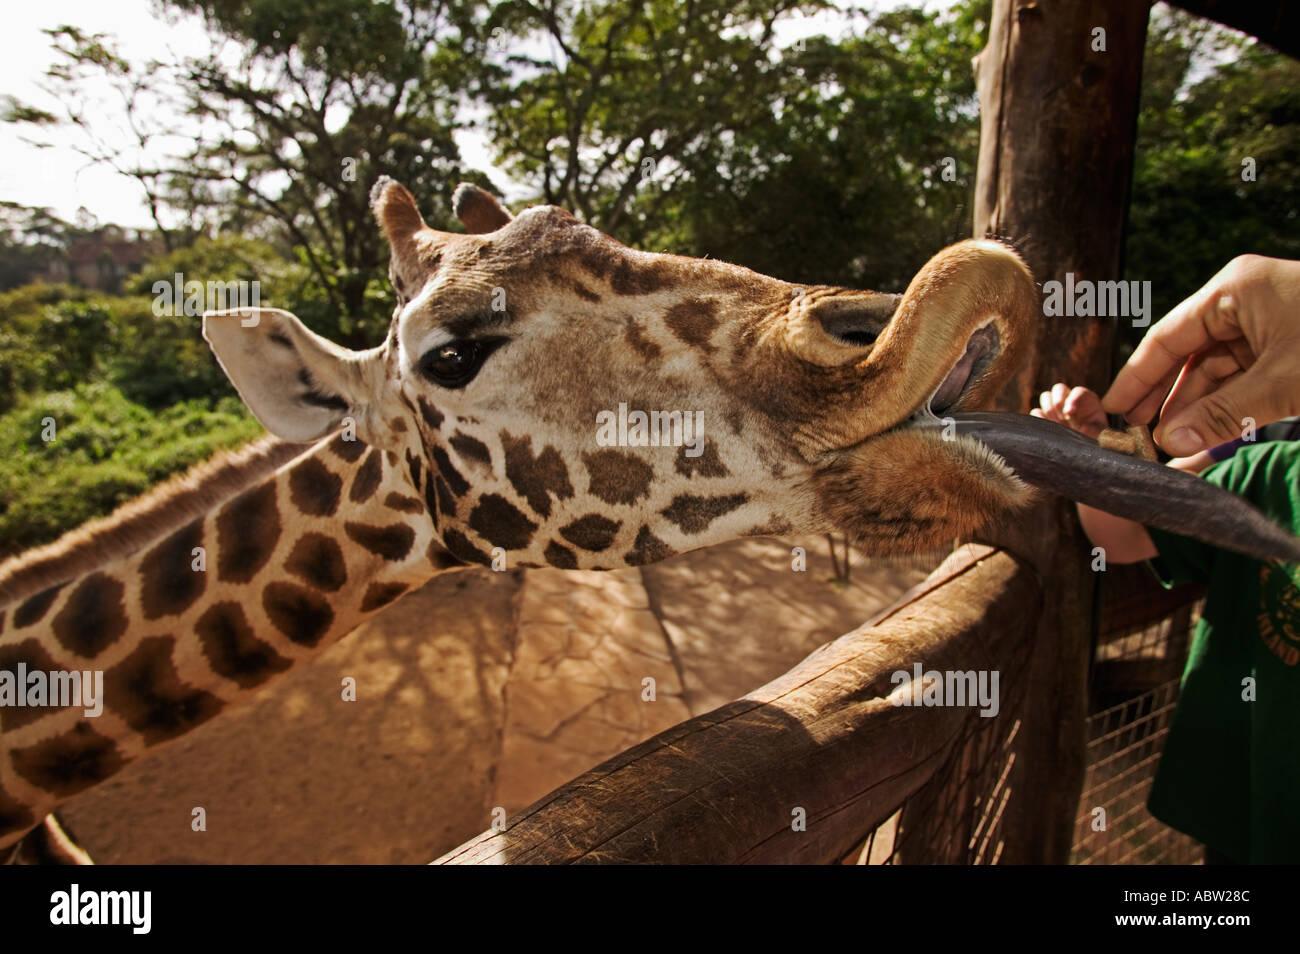 Rothschild Giraffe Giraffa camelopardalis rothschildi With guide Giraffe Centre Nairobi Kenya - Stock Image